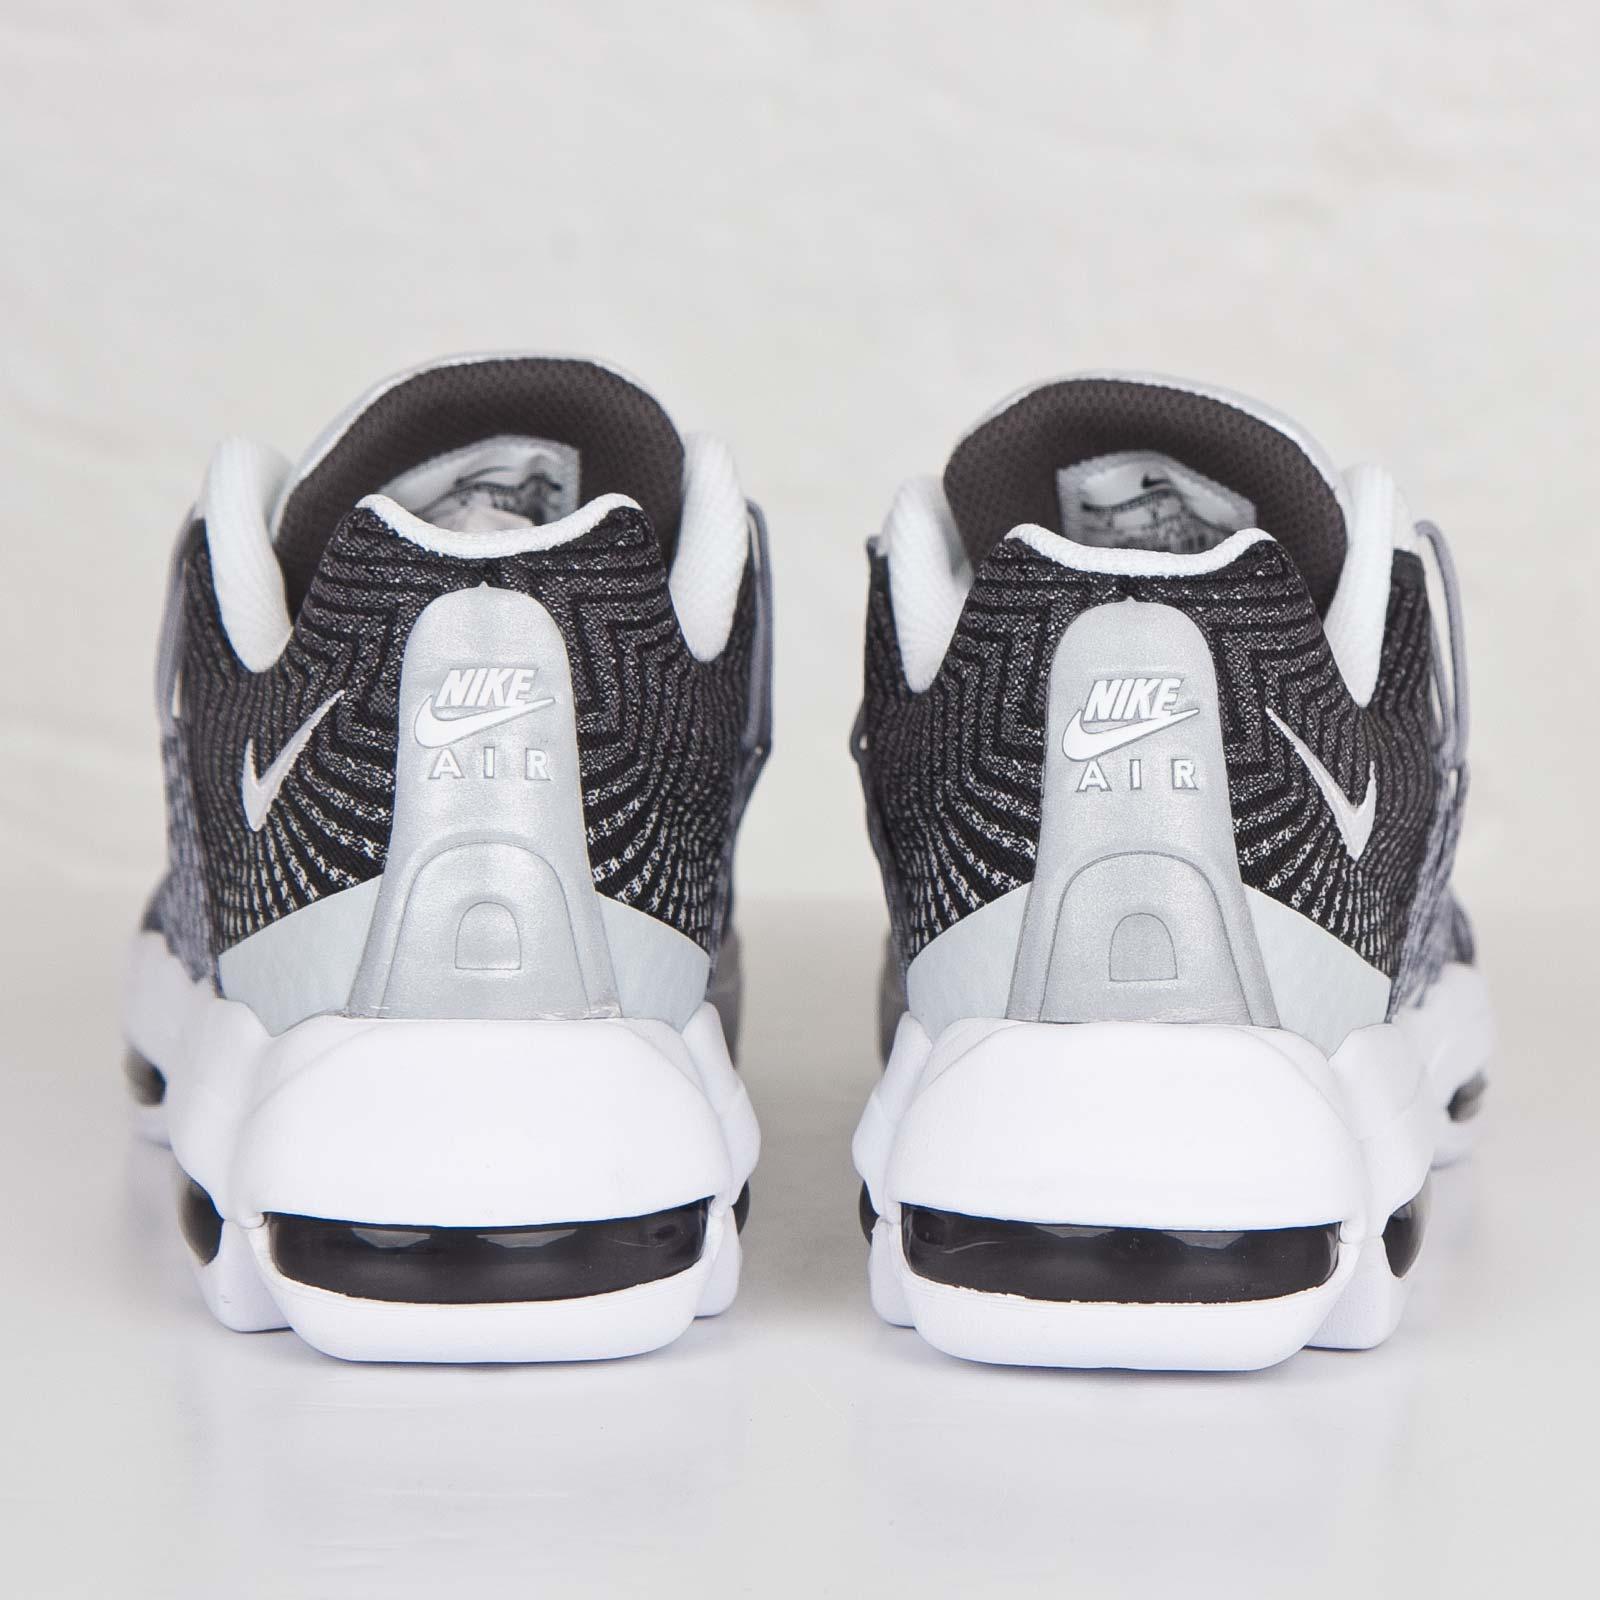 wholesale dealer 1a76e 83136 Nike Air Max 95 Ultra Jacquard - 749771-100 - Sneakersnstuff   sneakers    streetwear online since 1999